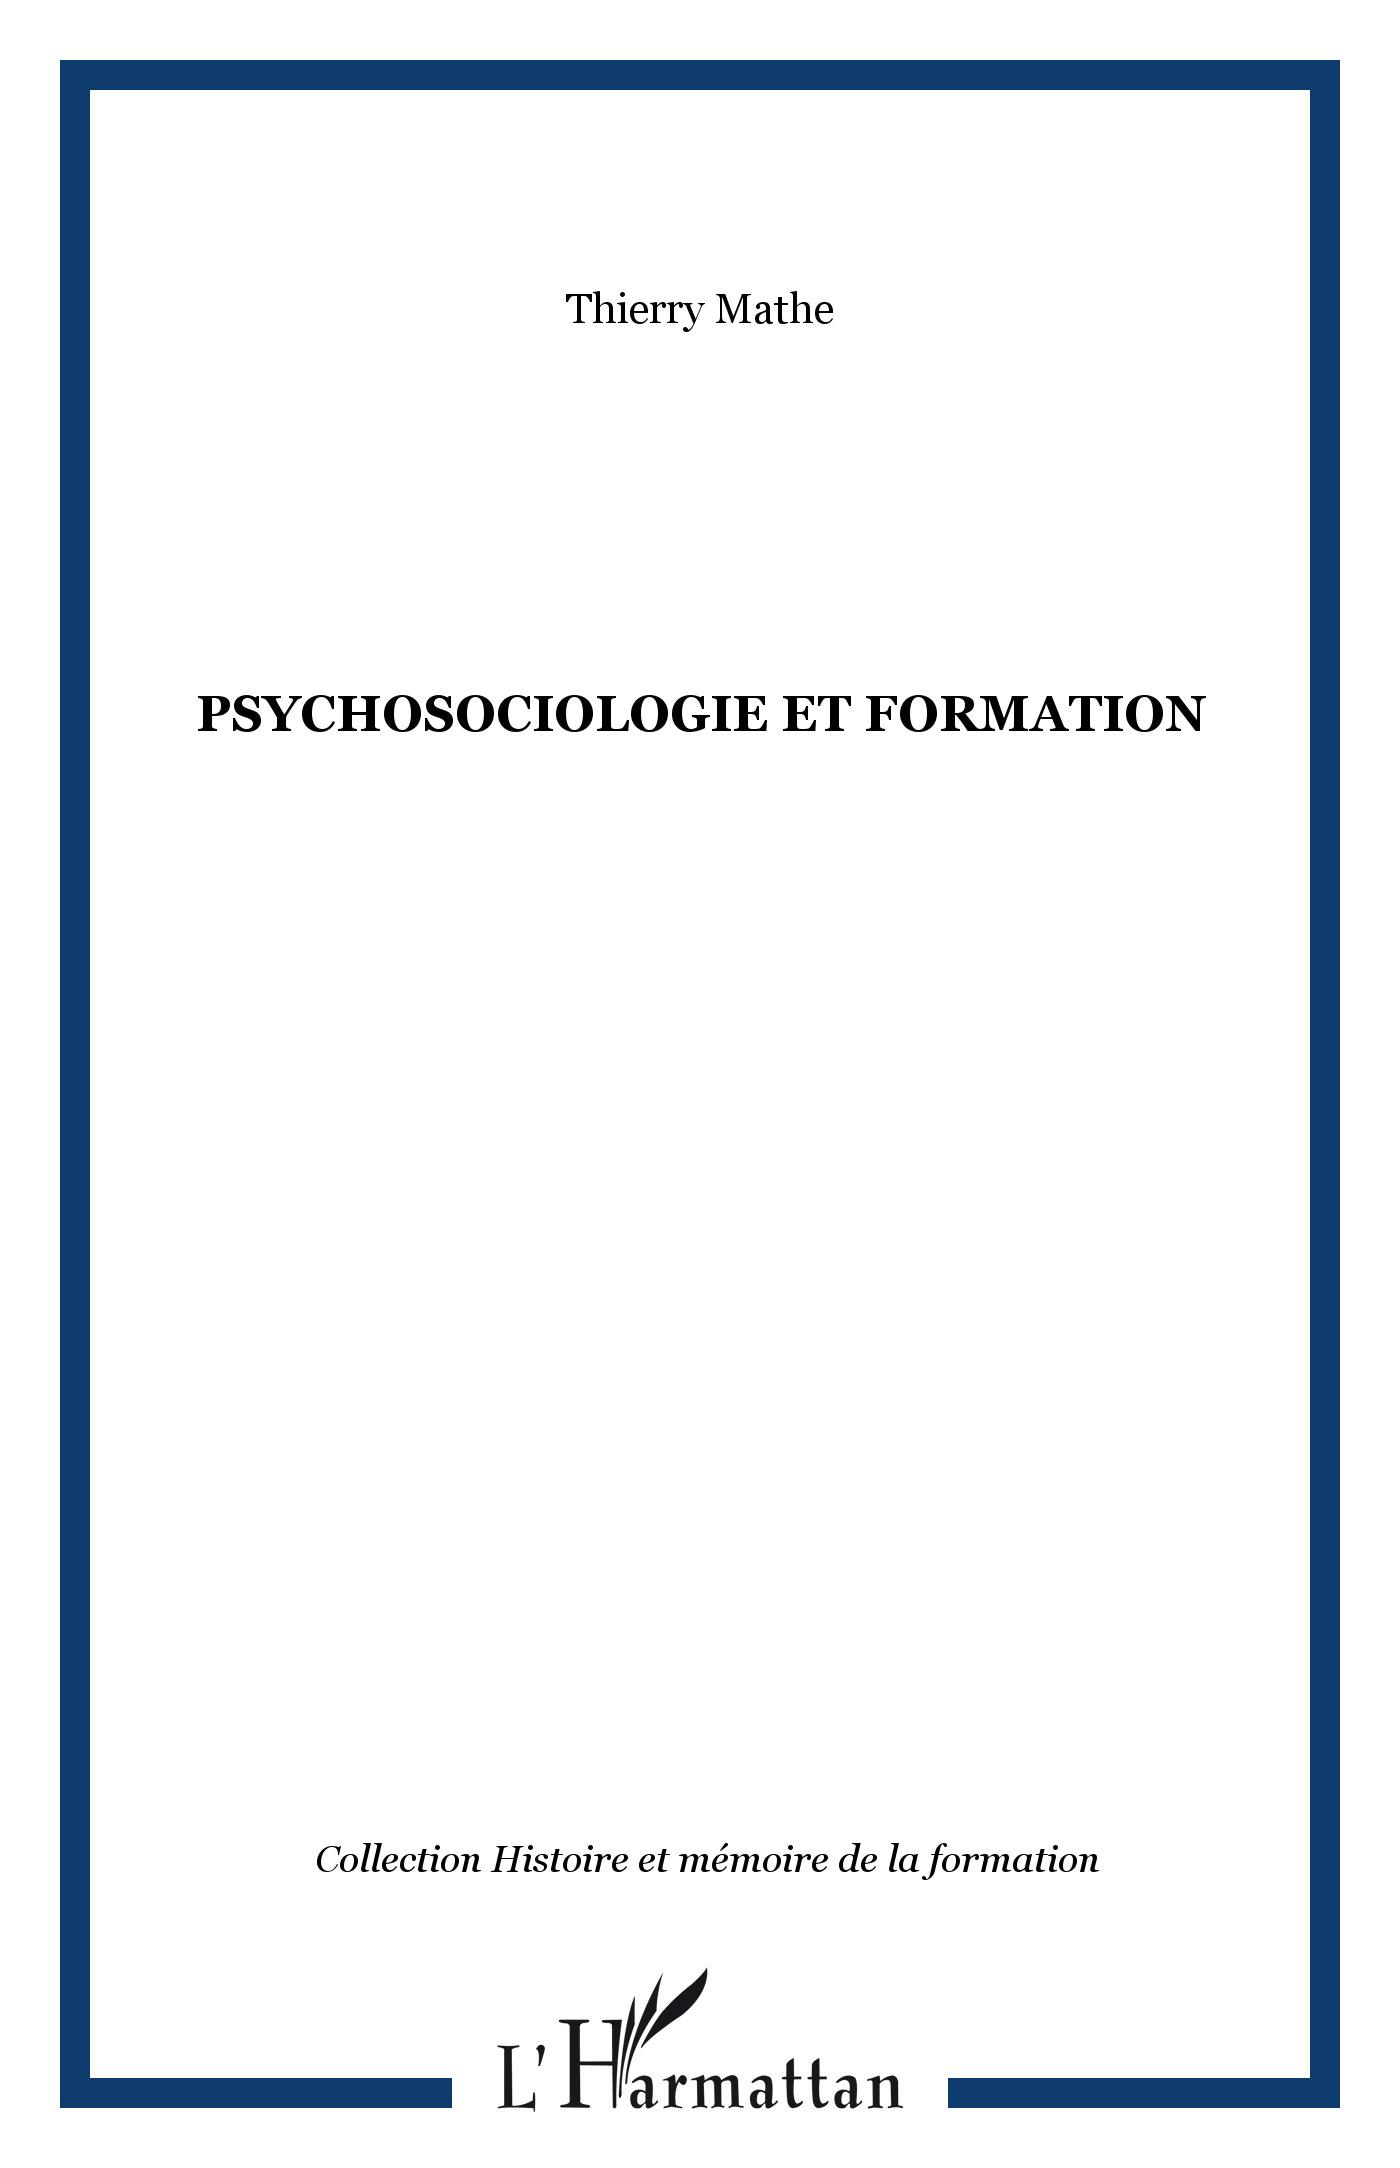 Psychosociologie et